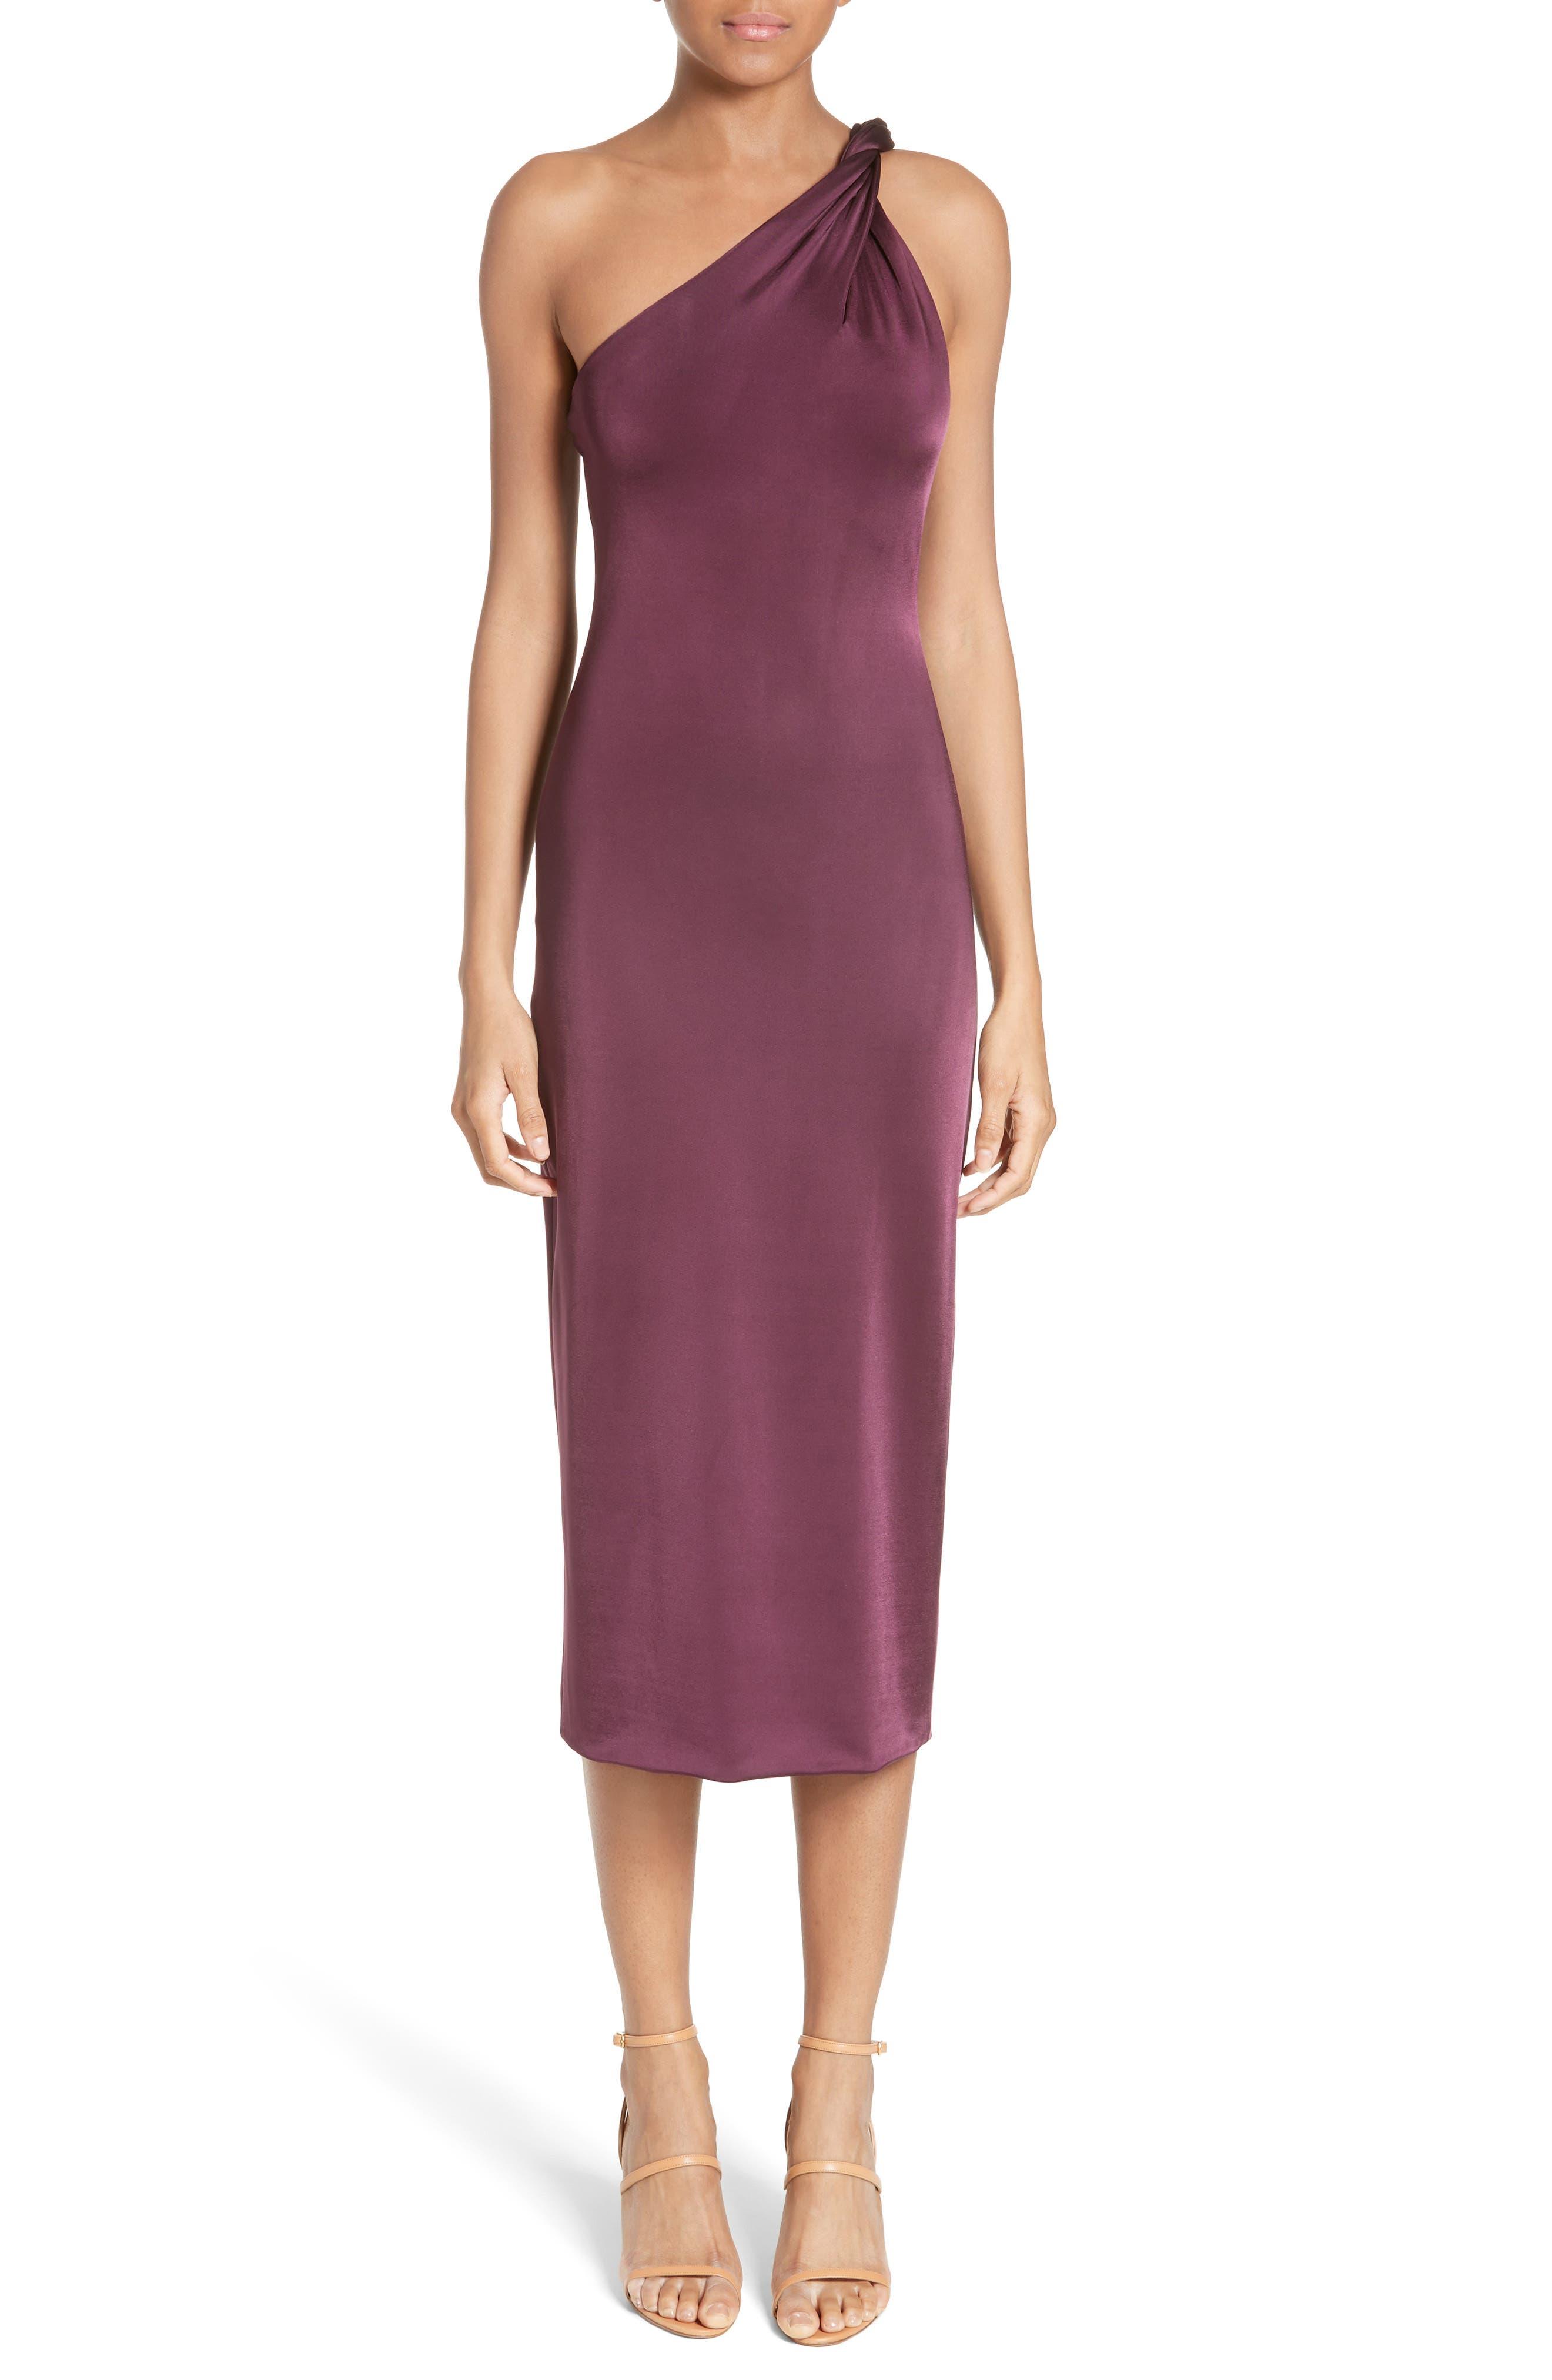 Main Image - Cushnie et Ochs Twisted Jersey One-Shoulder Dress